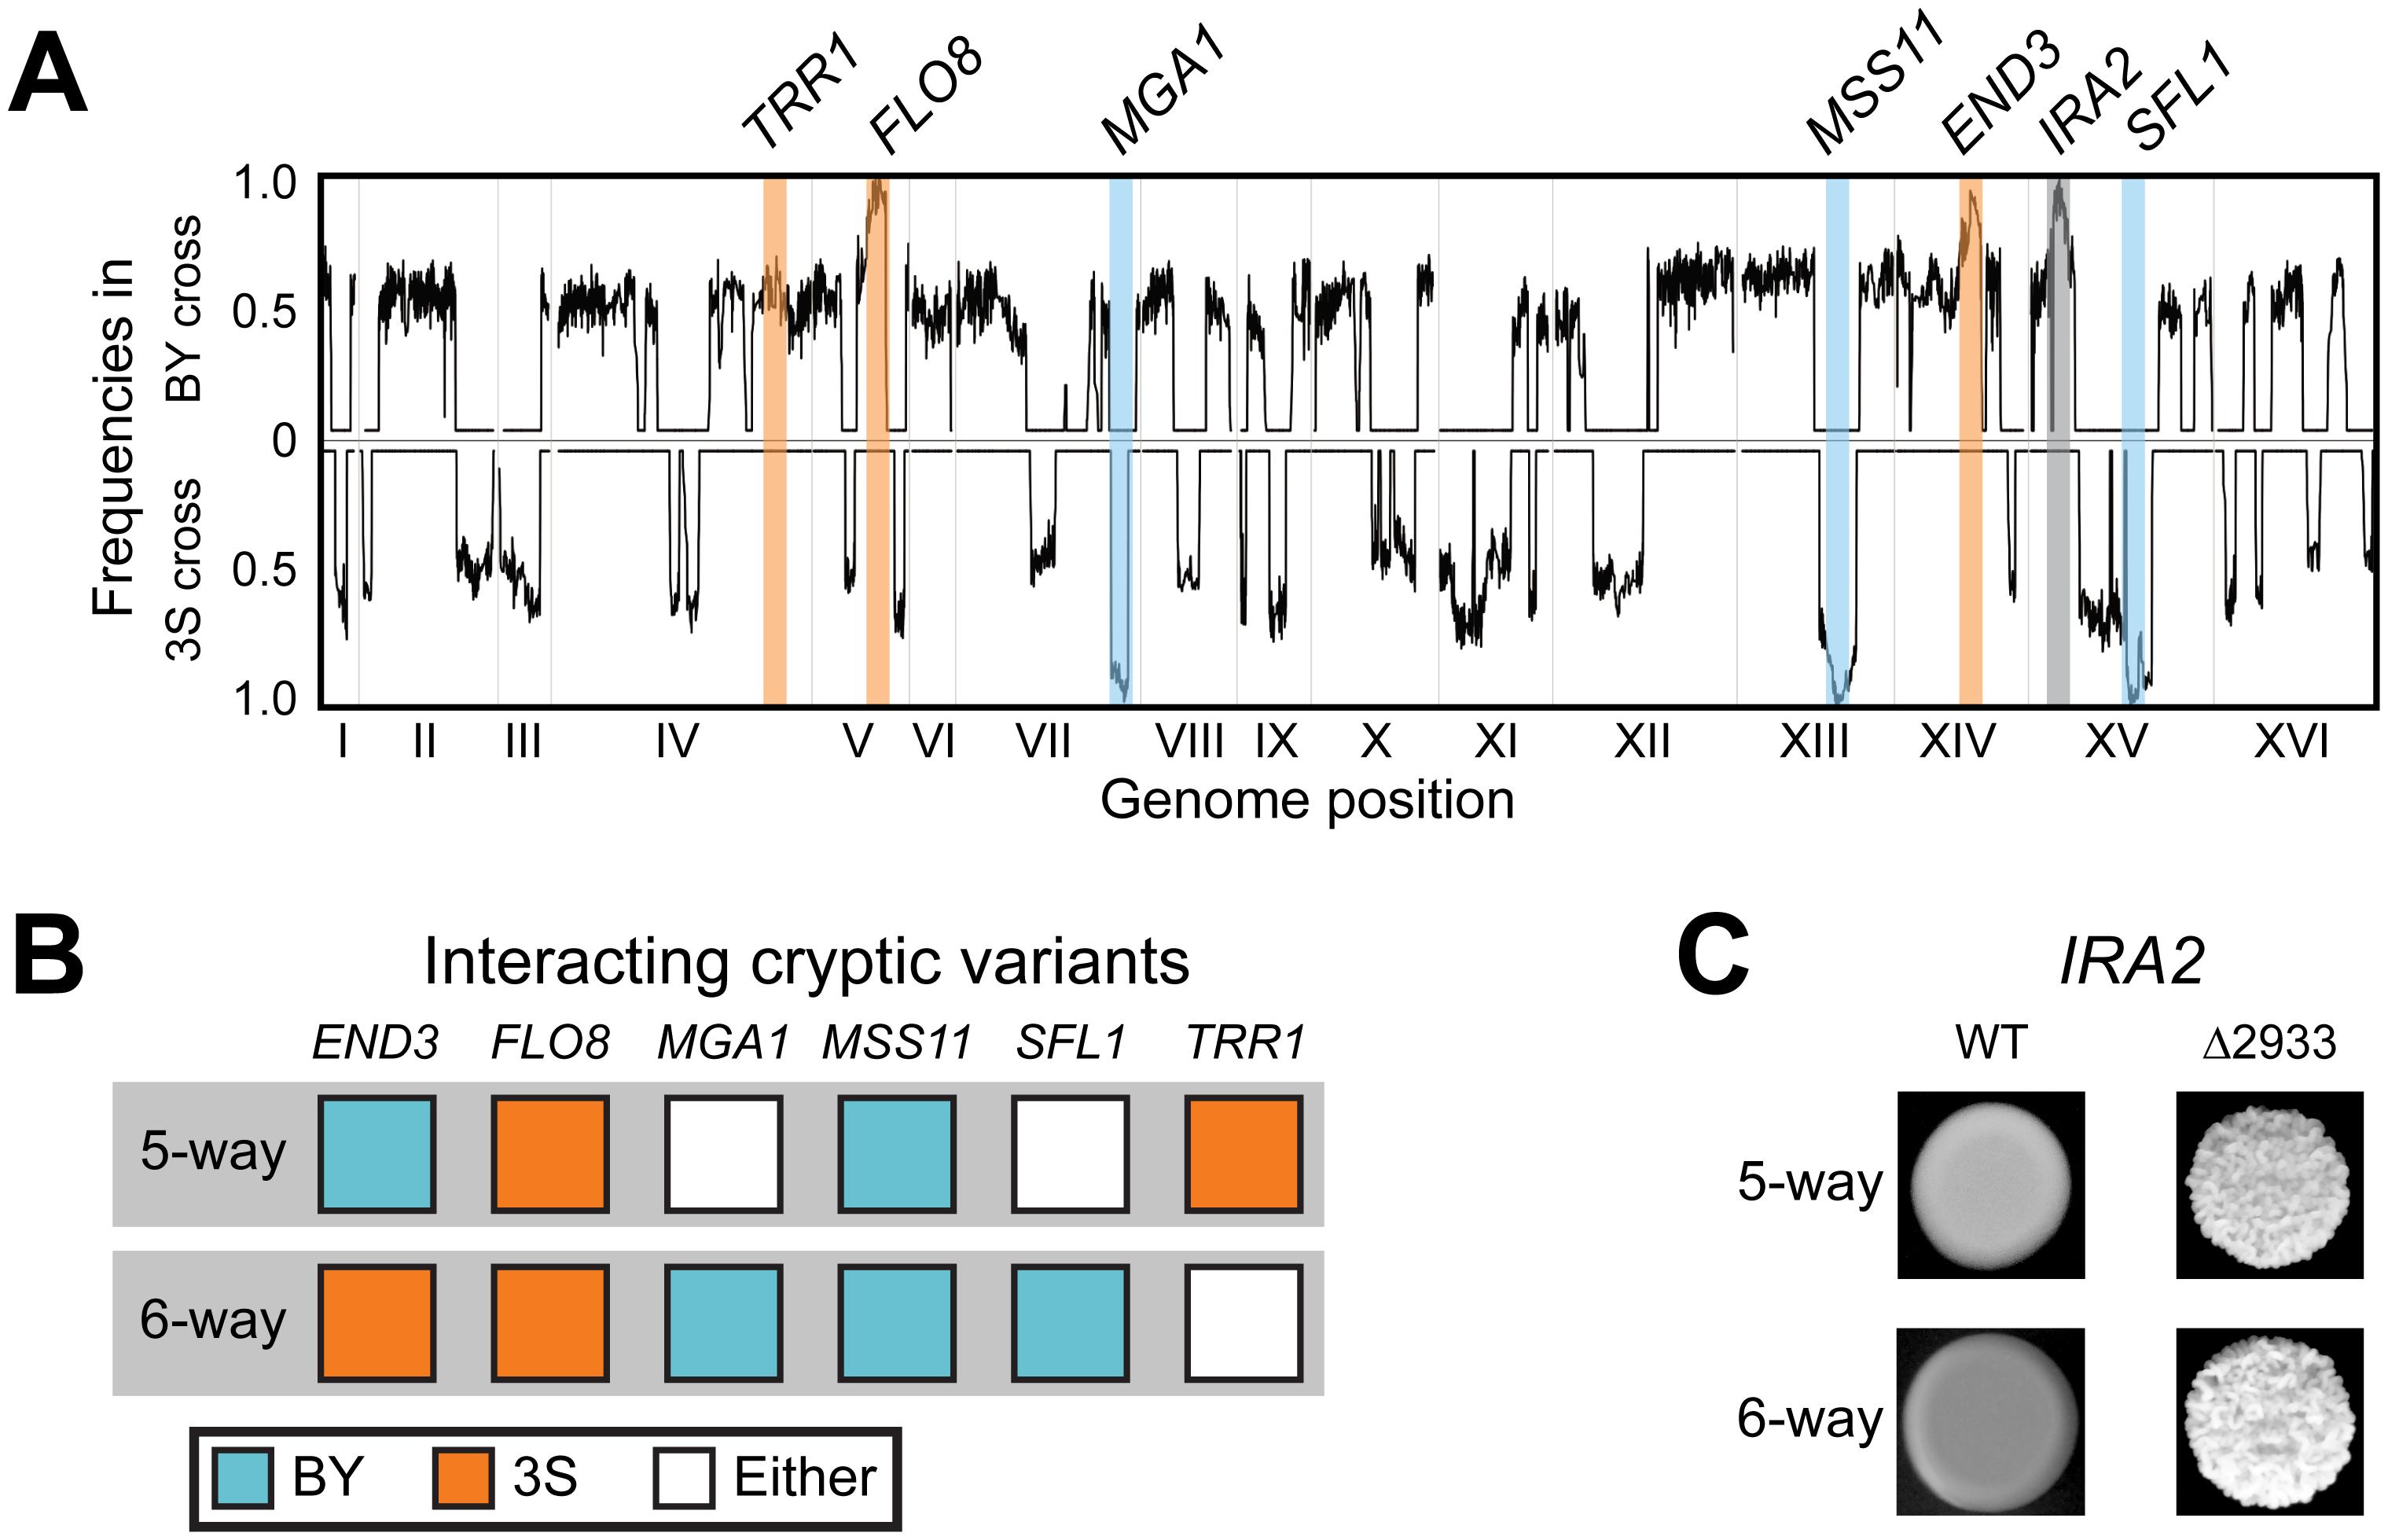 Characterization of the six-way genetic interaction.